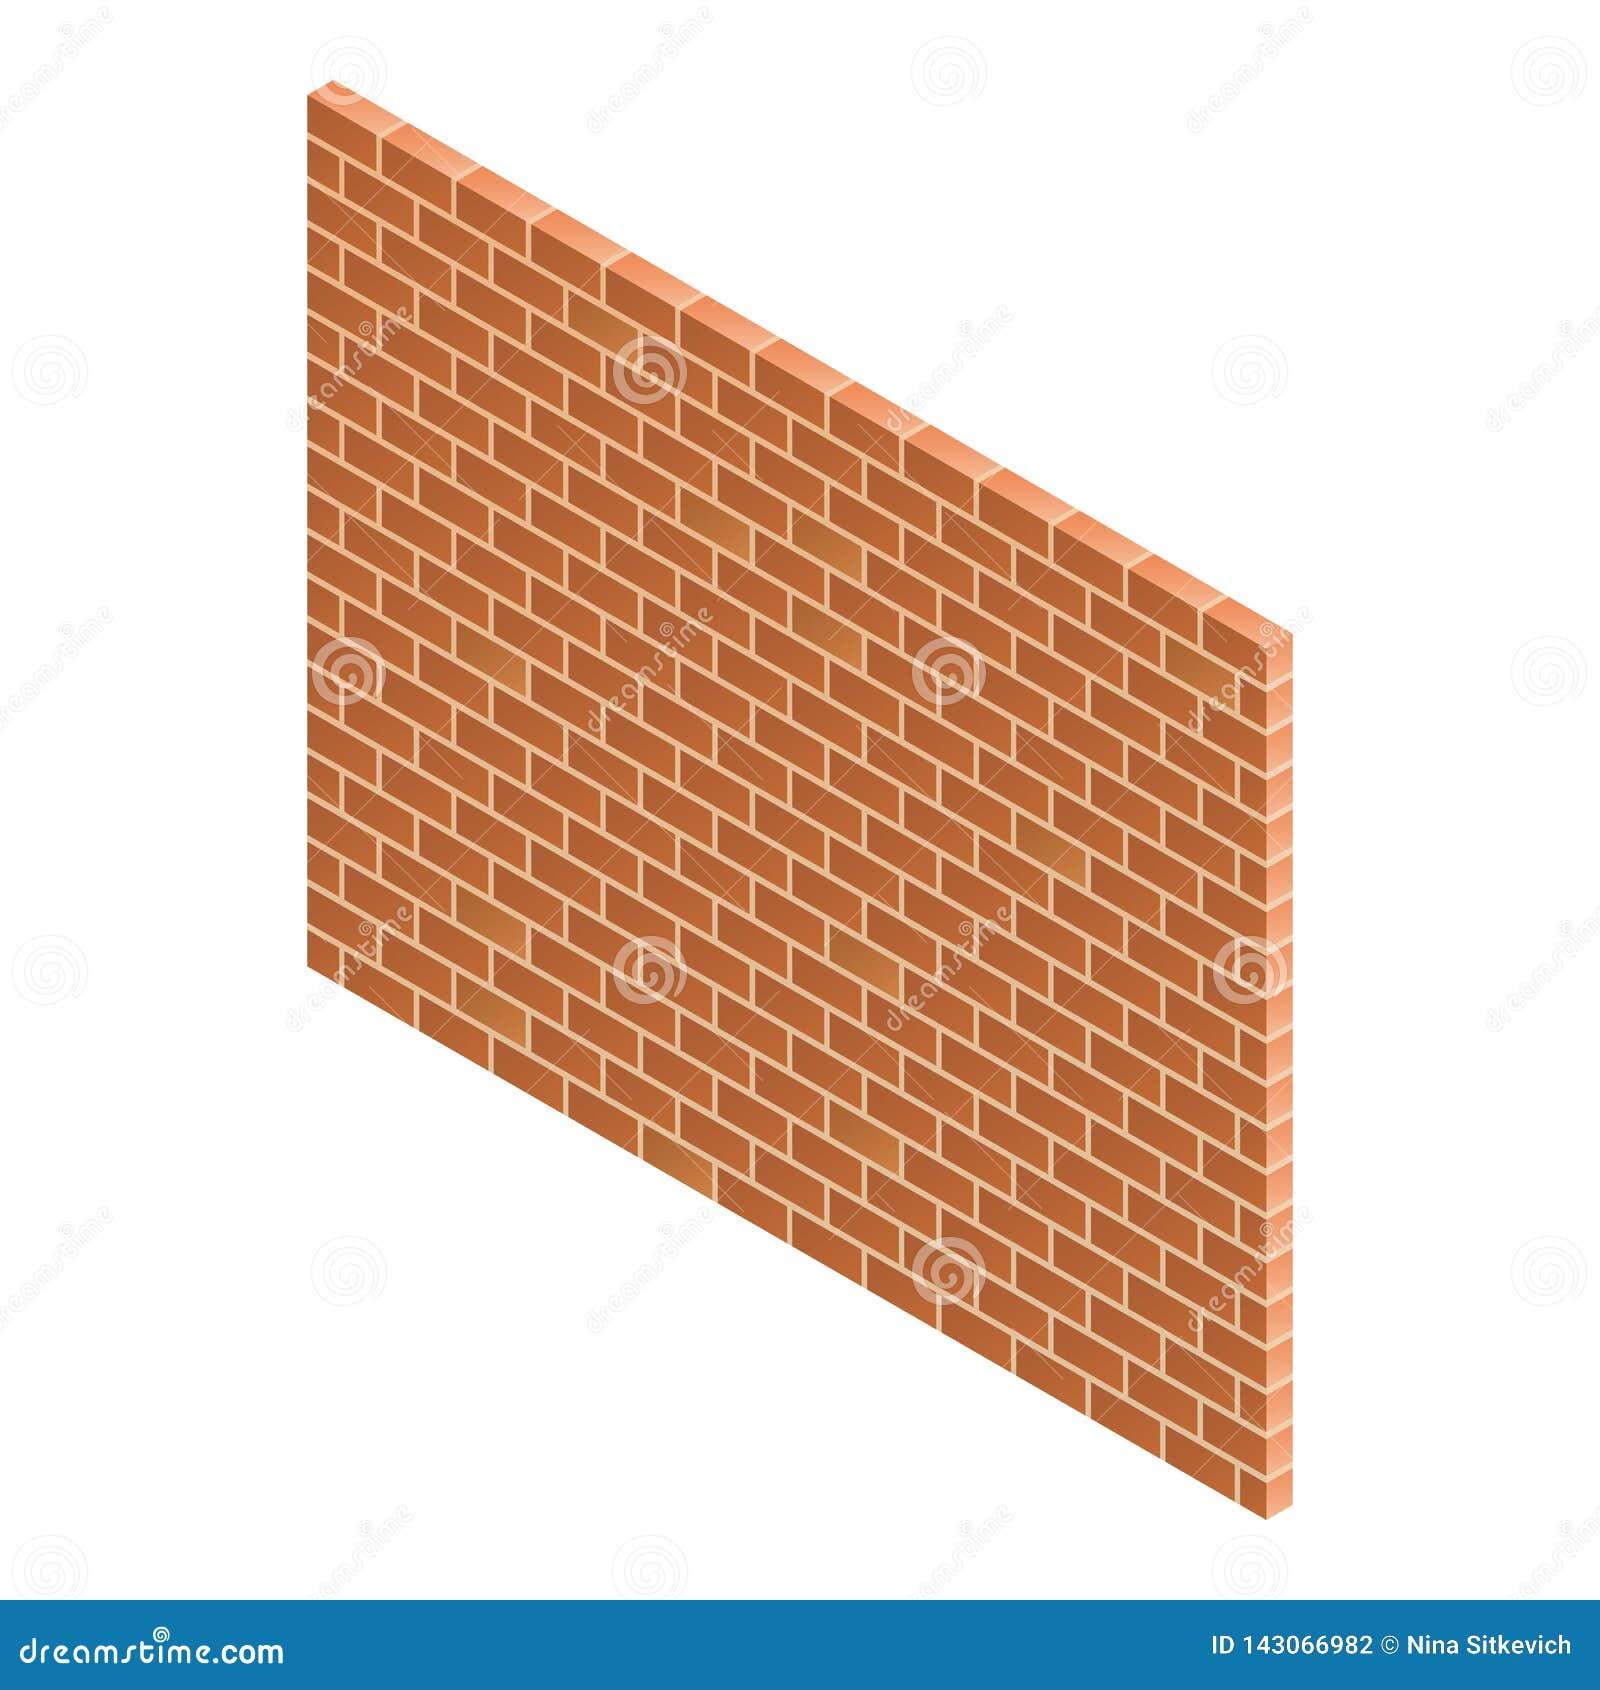 Brick wall icon, isometric style